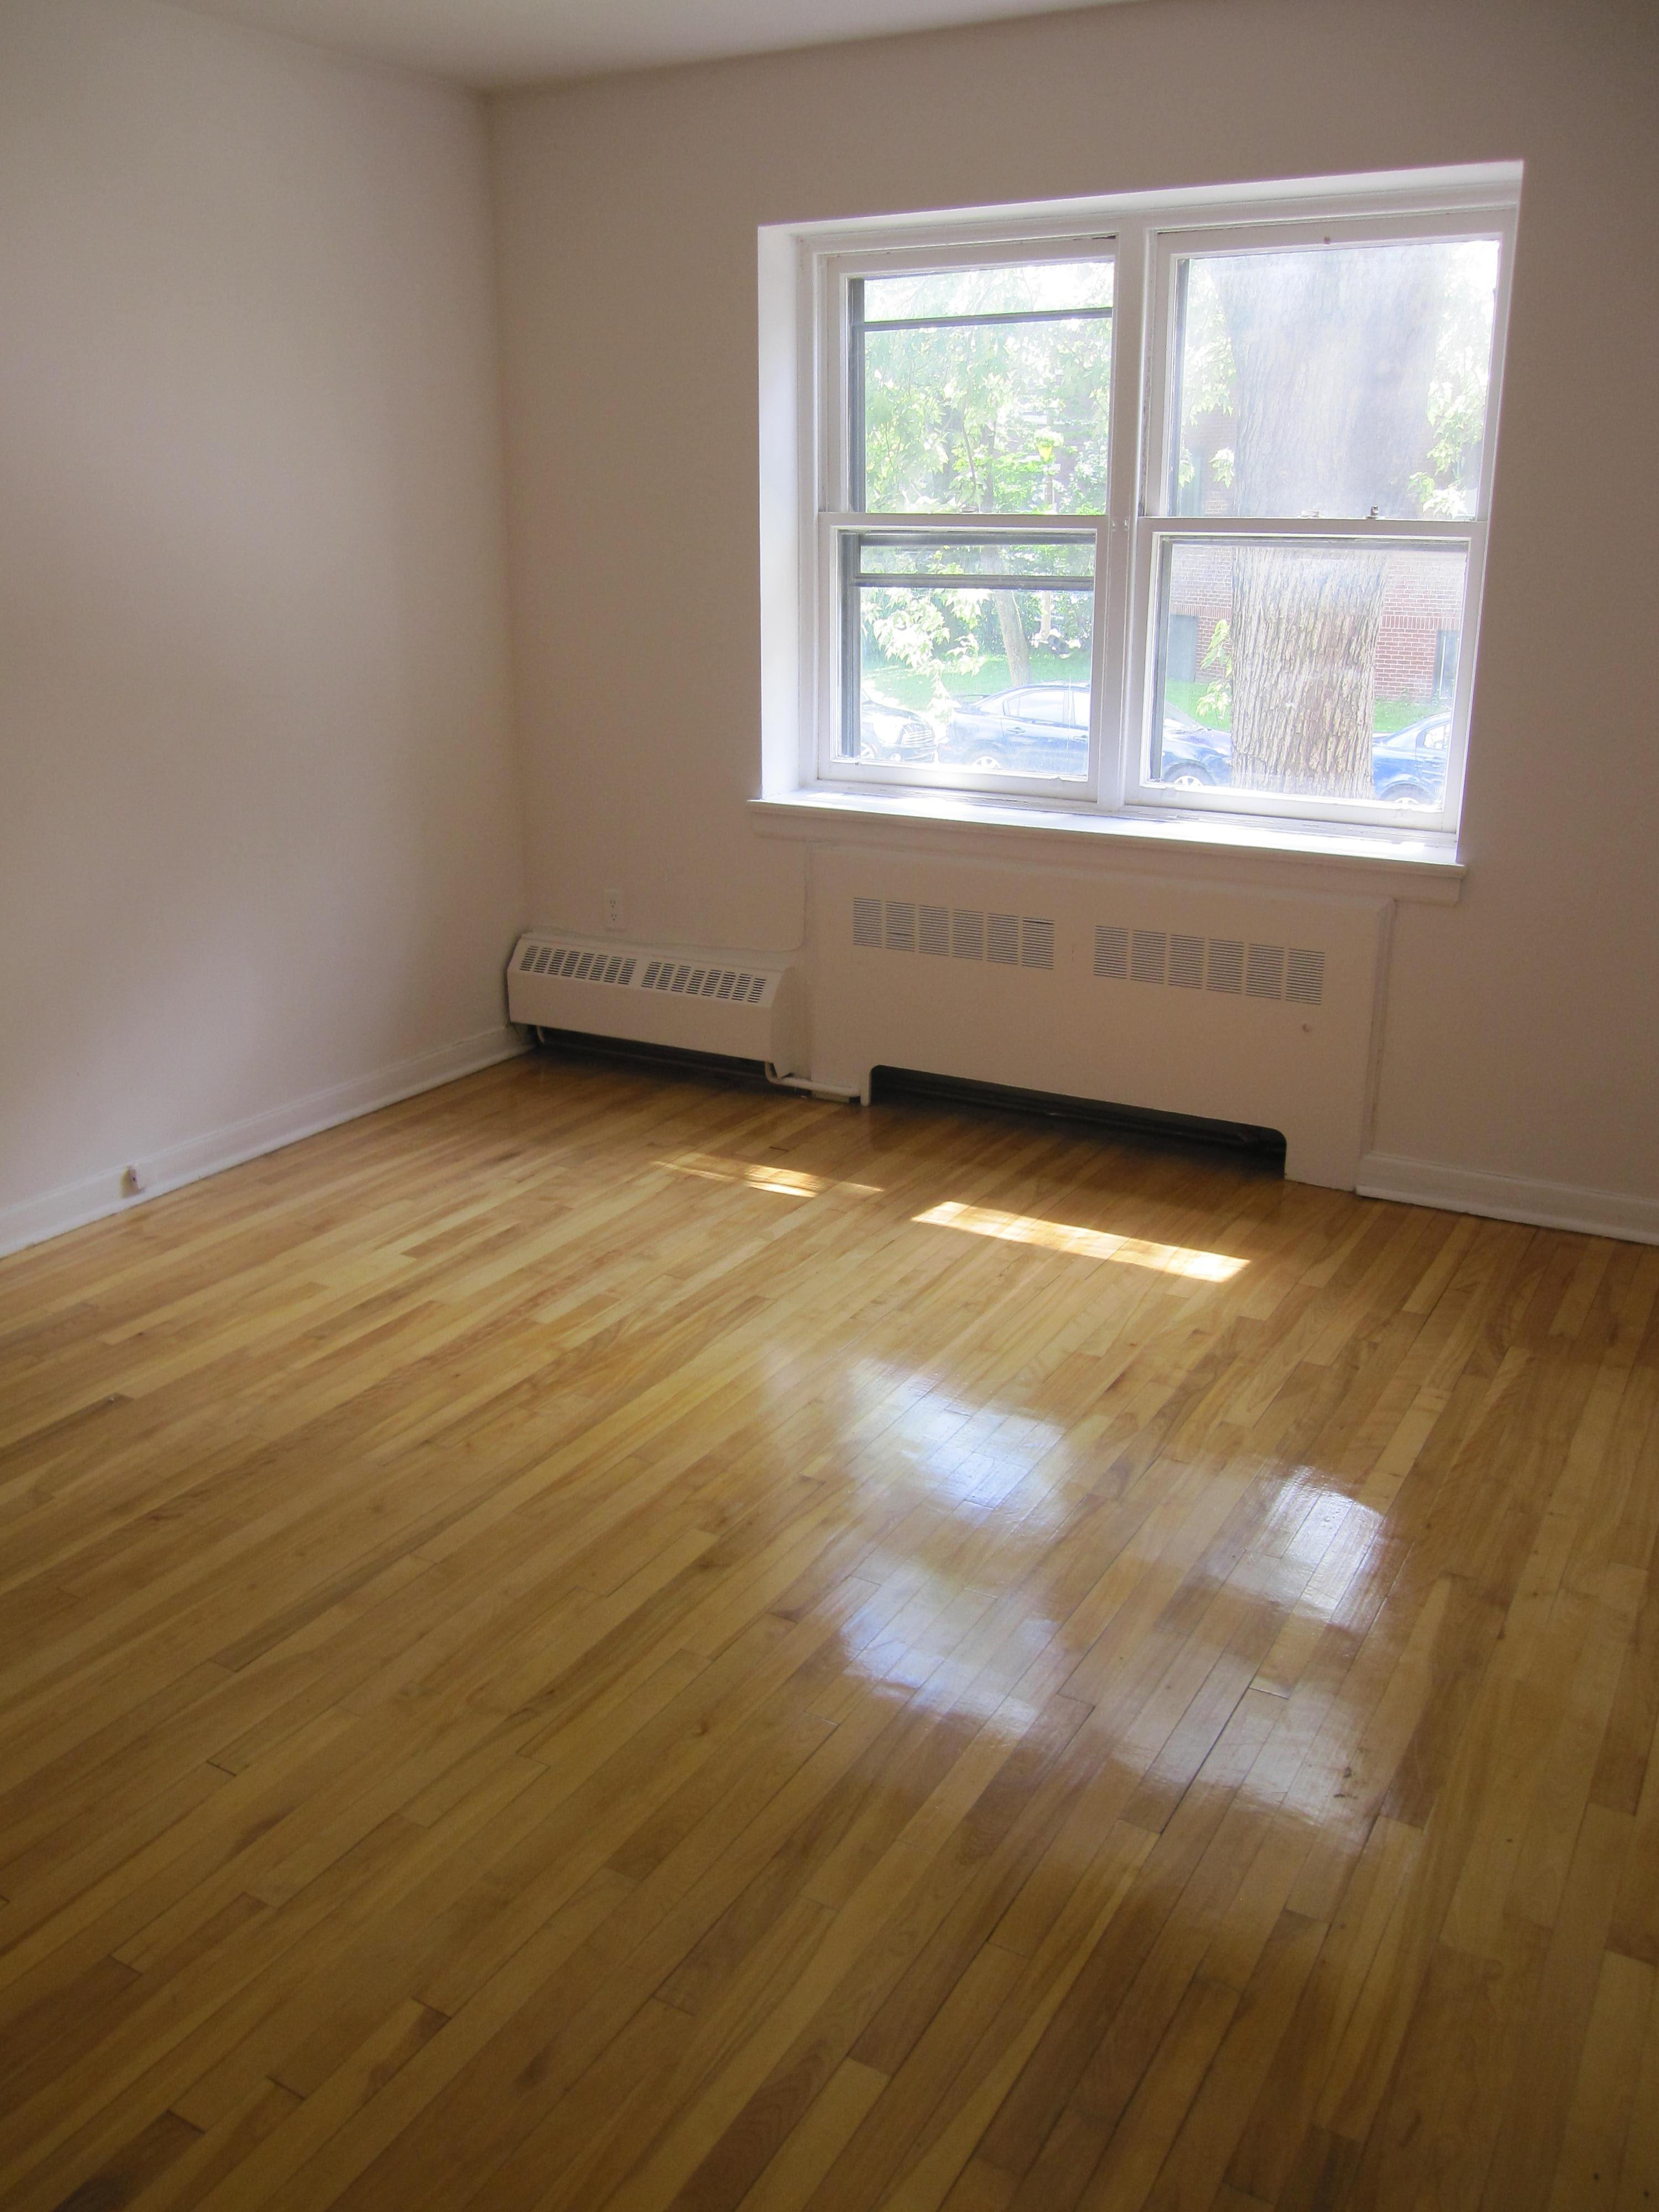 2 bedroom Apartments for rent in Notre-Dame-de-Grace at 4635 Clanranald - Photo 02 - RentersPages – L23639